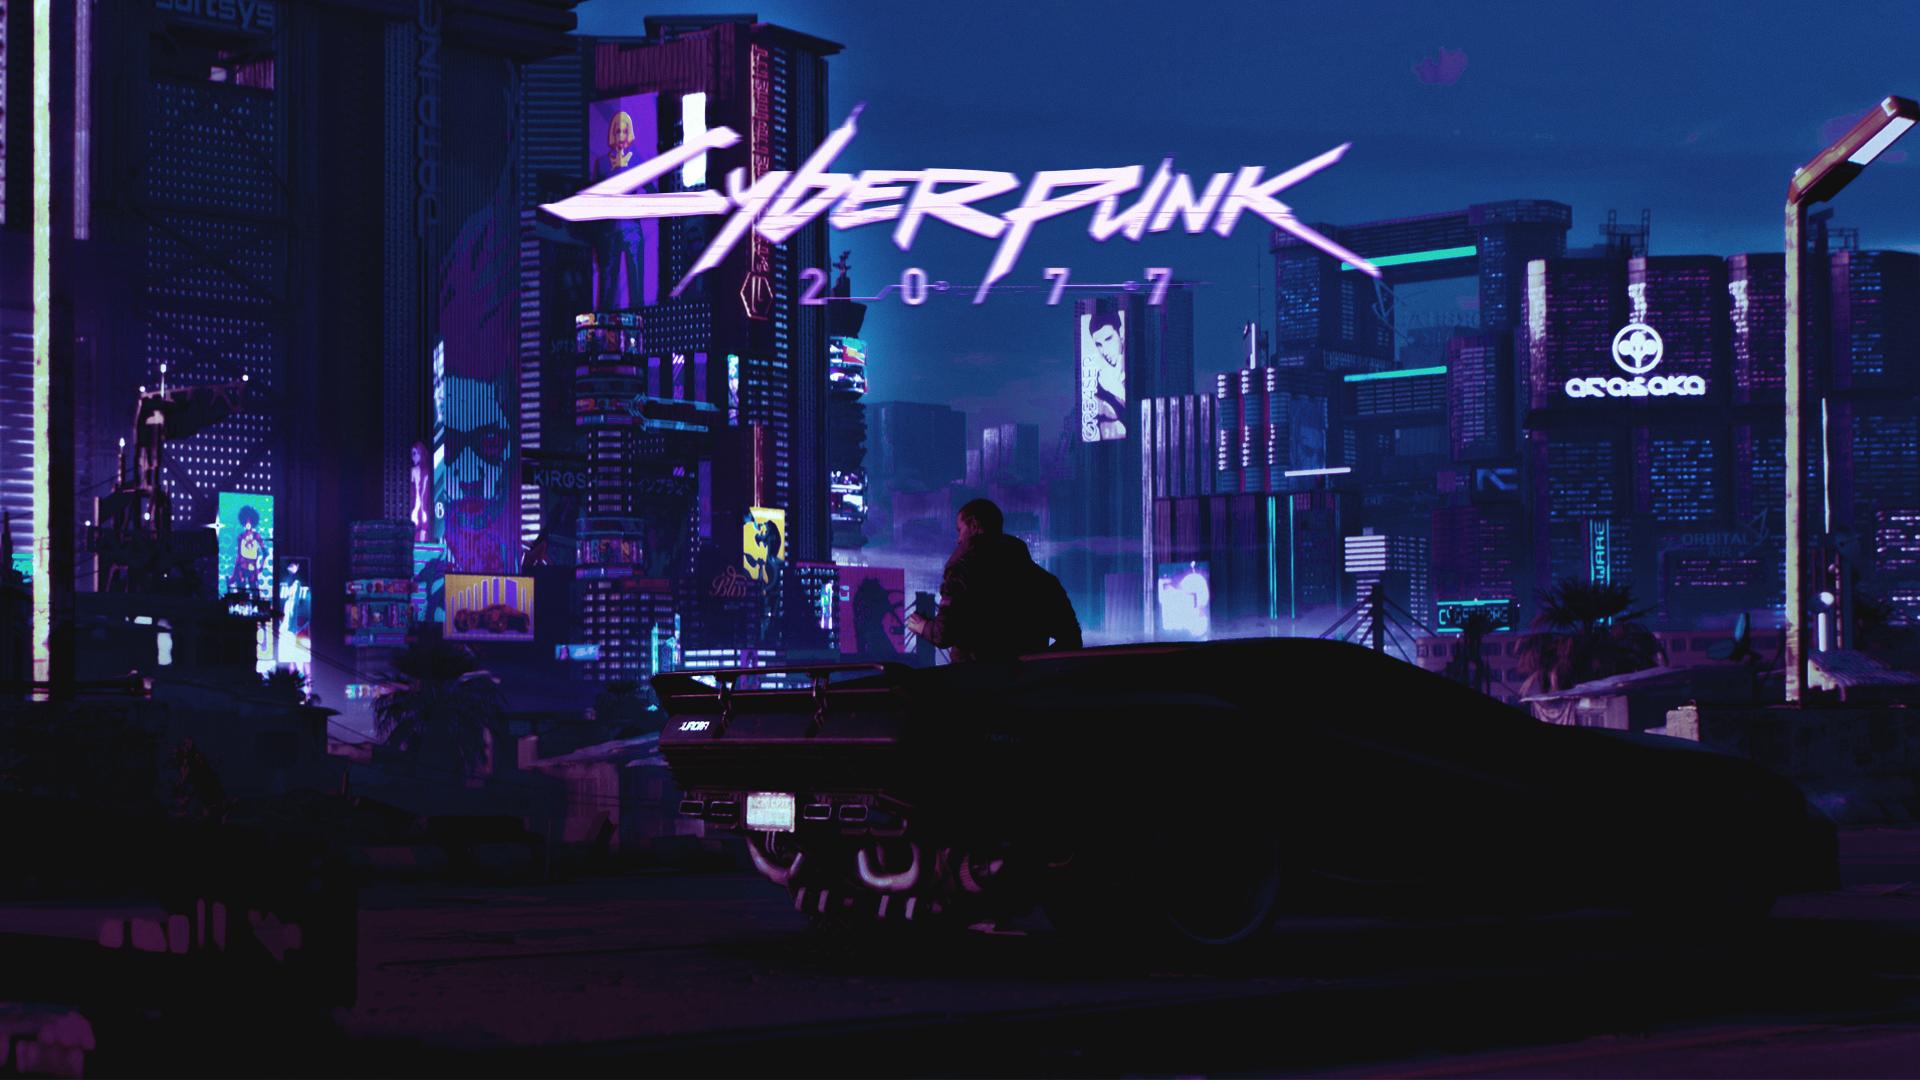 Cyberpunk 2077 Wallpaper 4k Cyberpunk 2077 21 9 1920x1080 Wallpaper Teahub Io